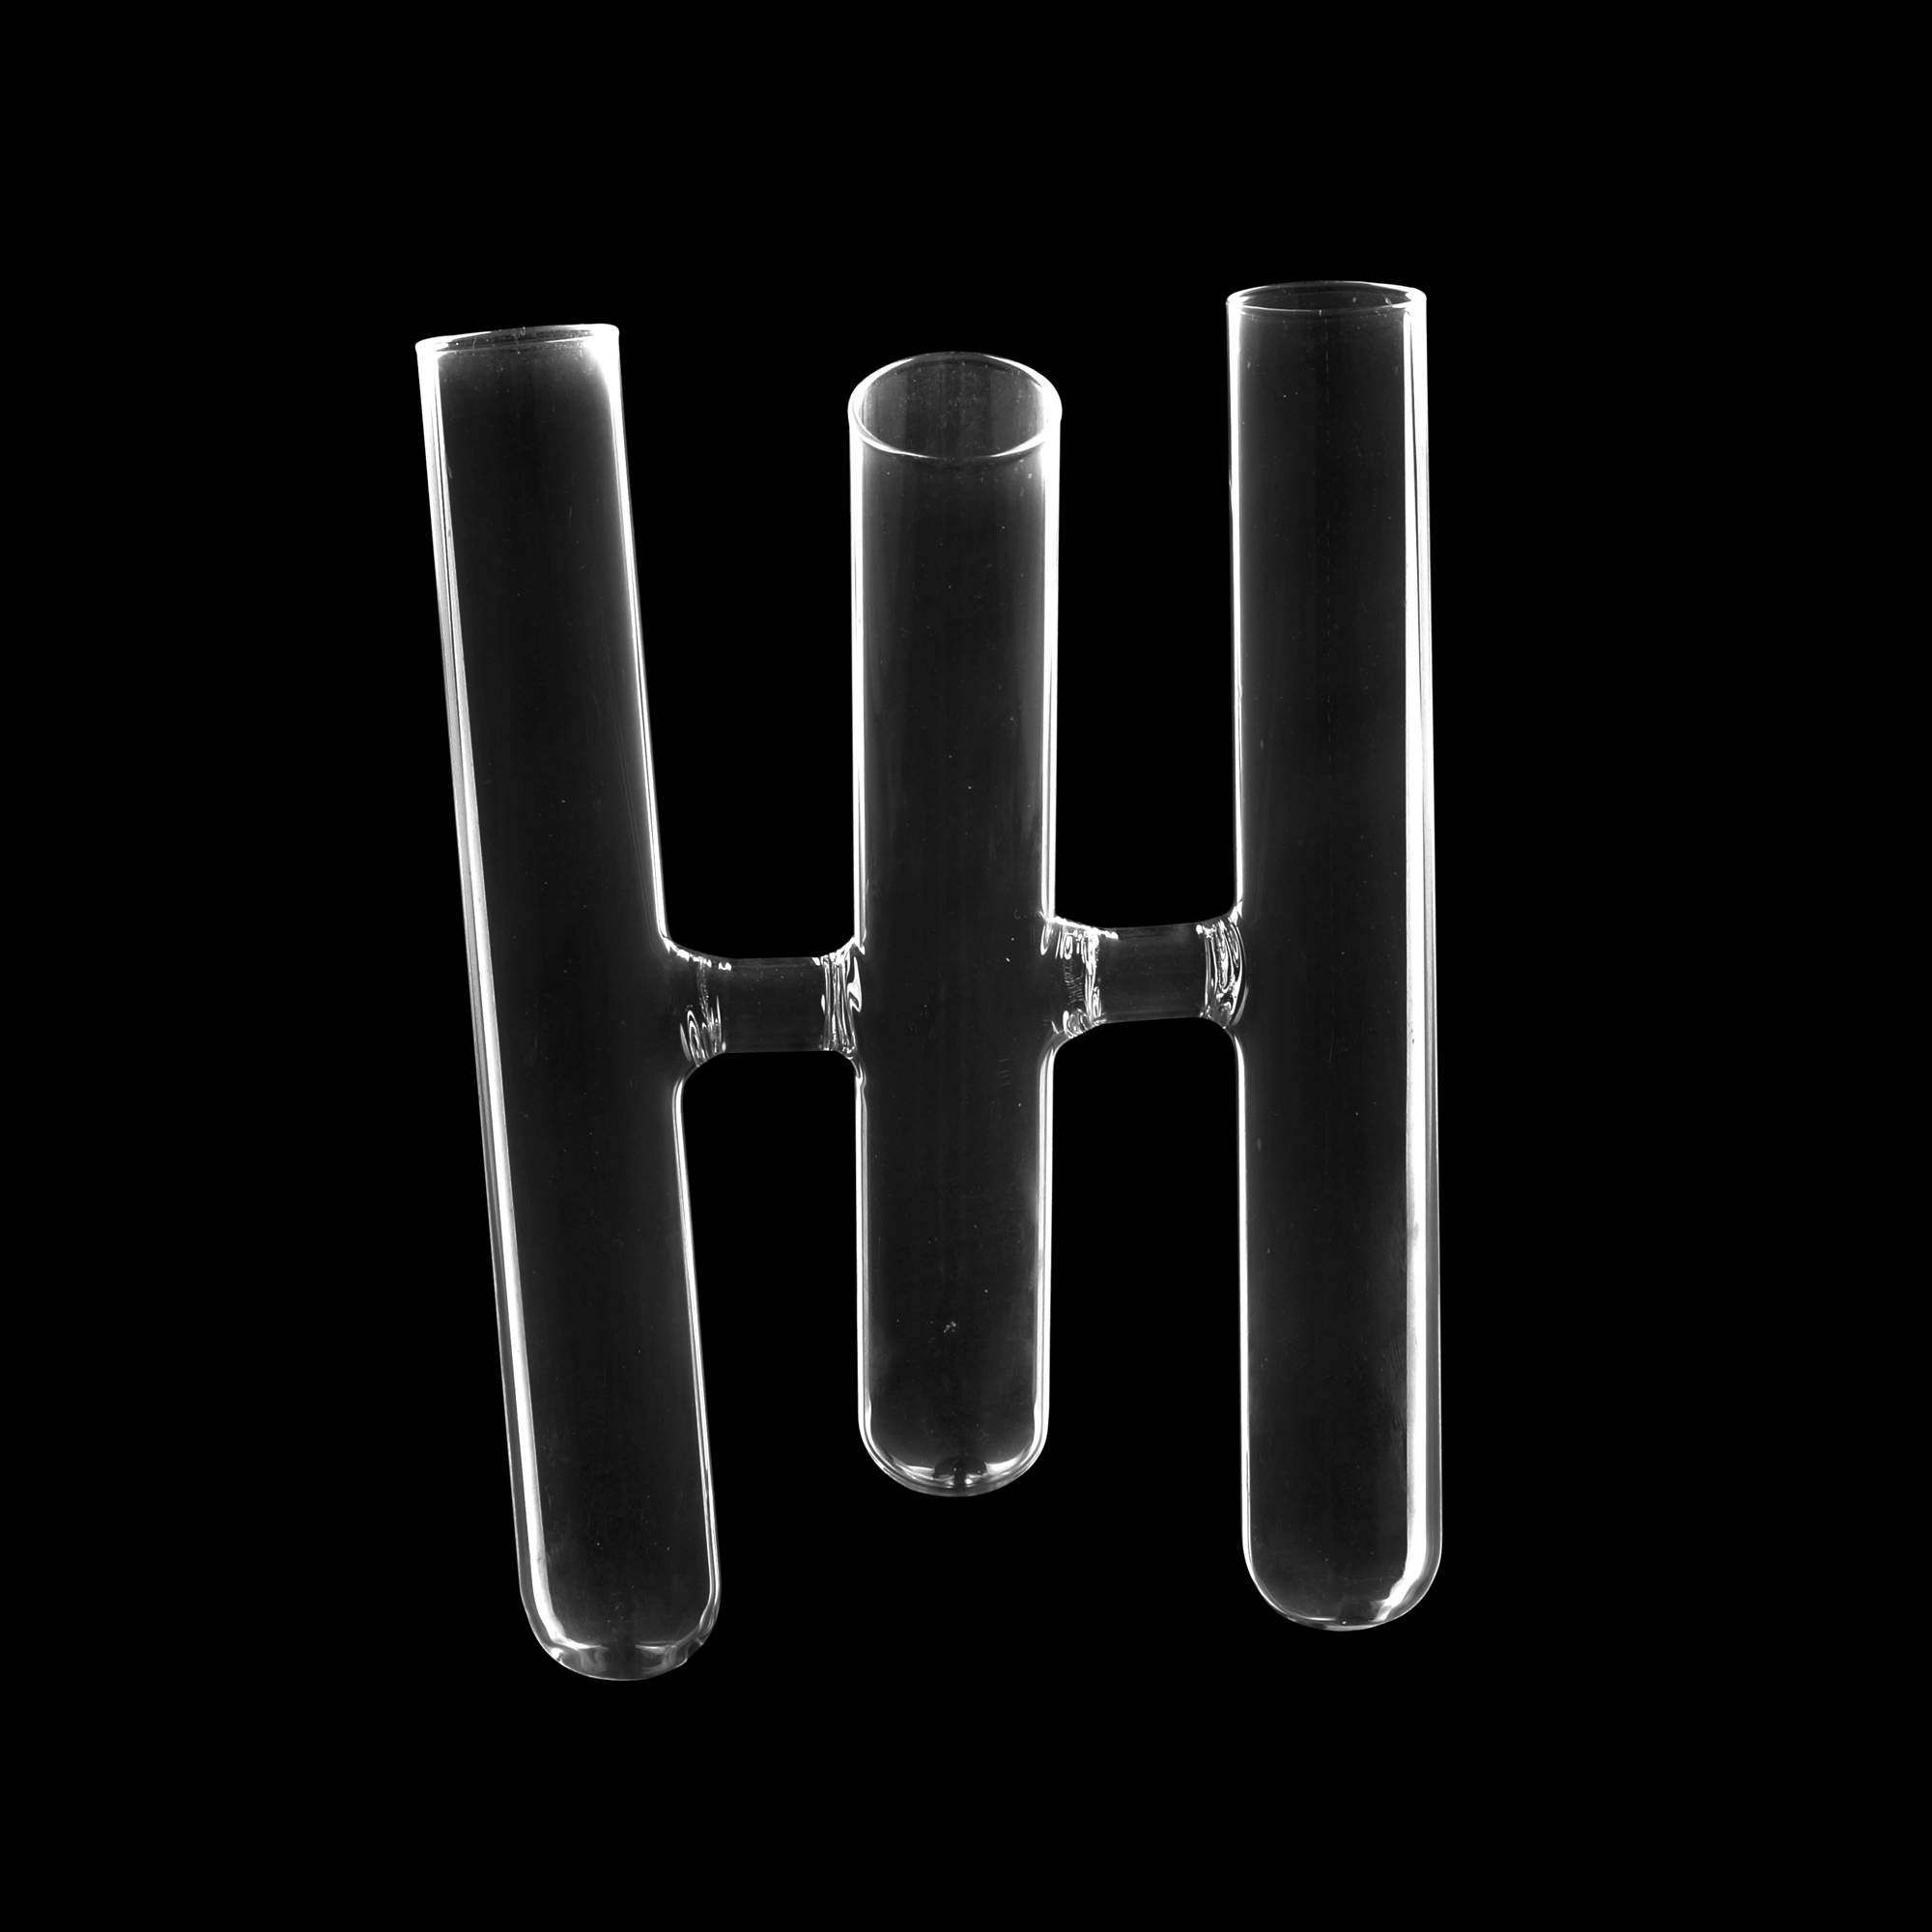 Vaso Vidro Transparente 15x12x20cm